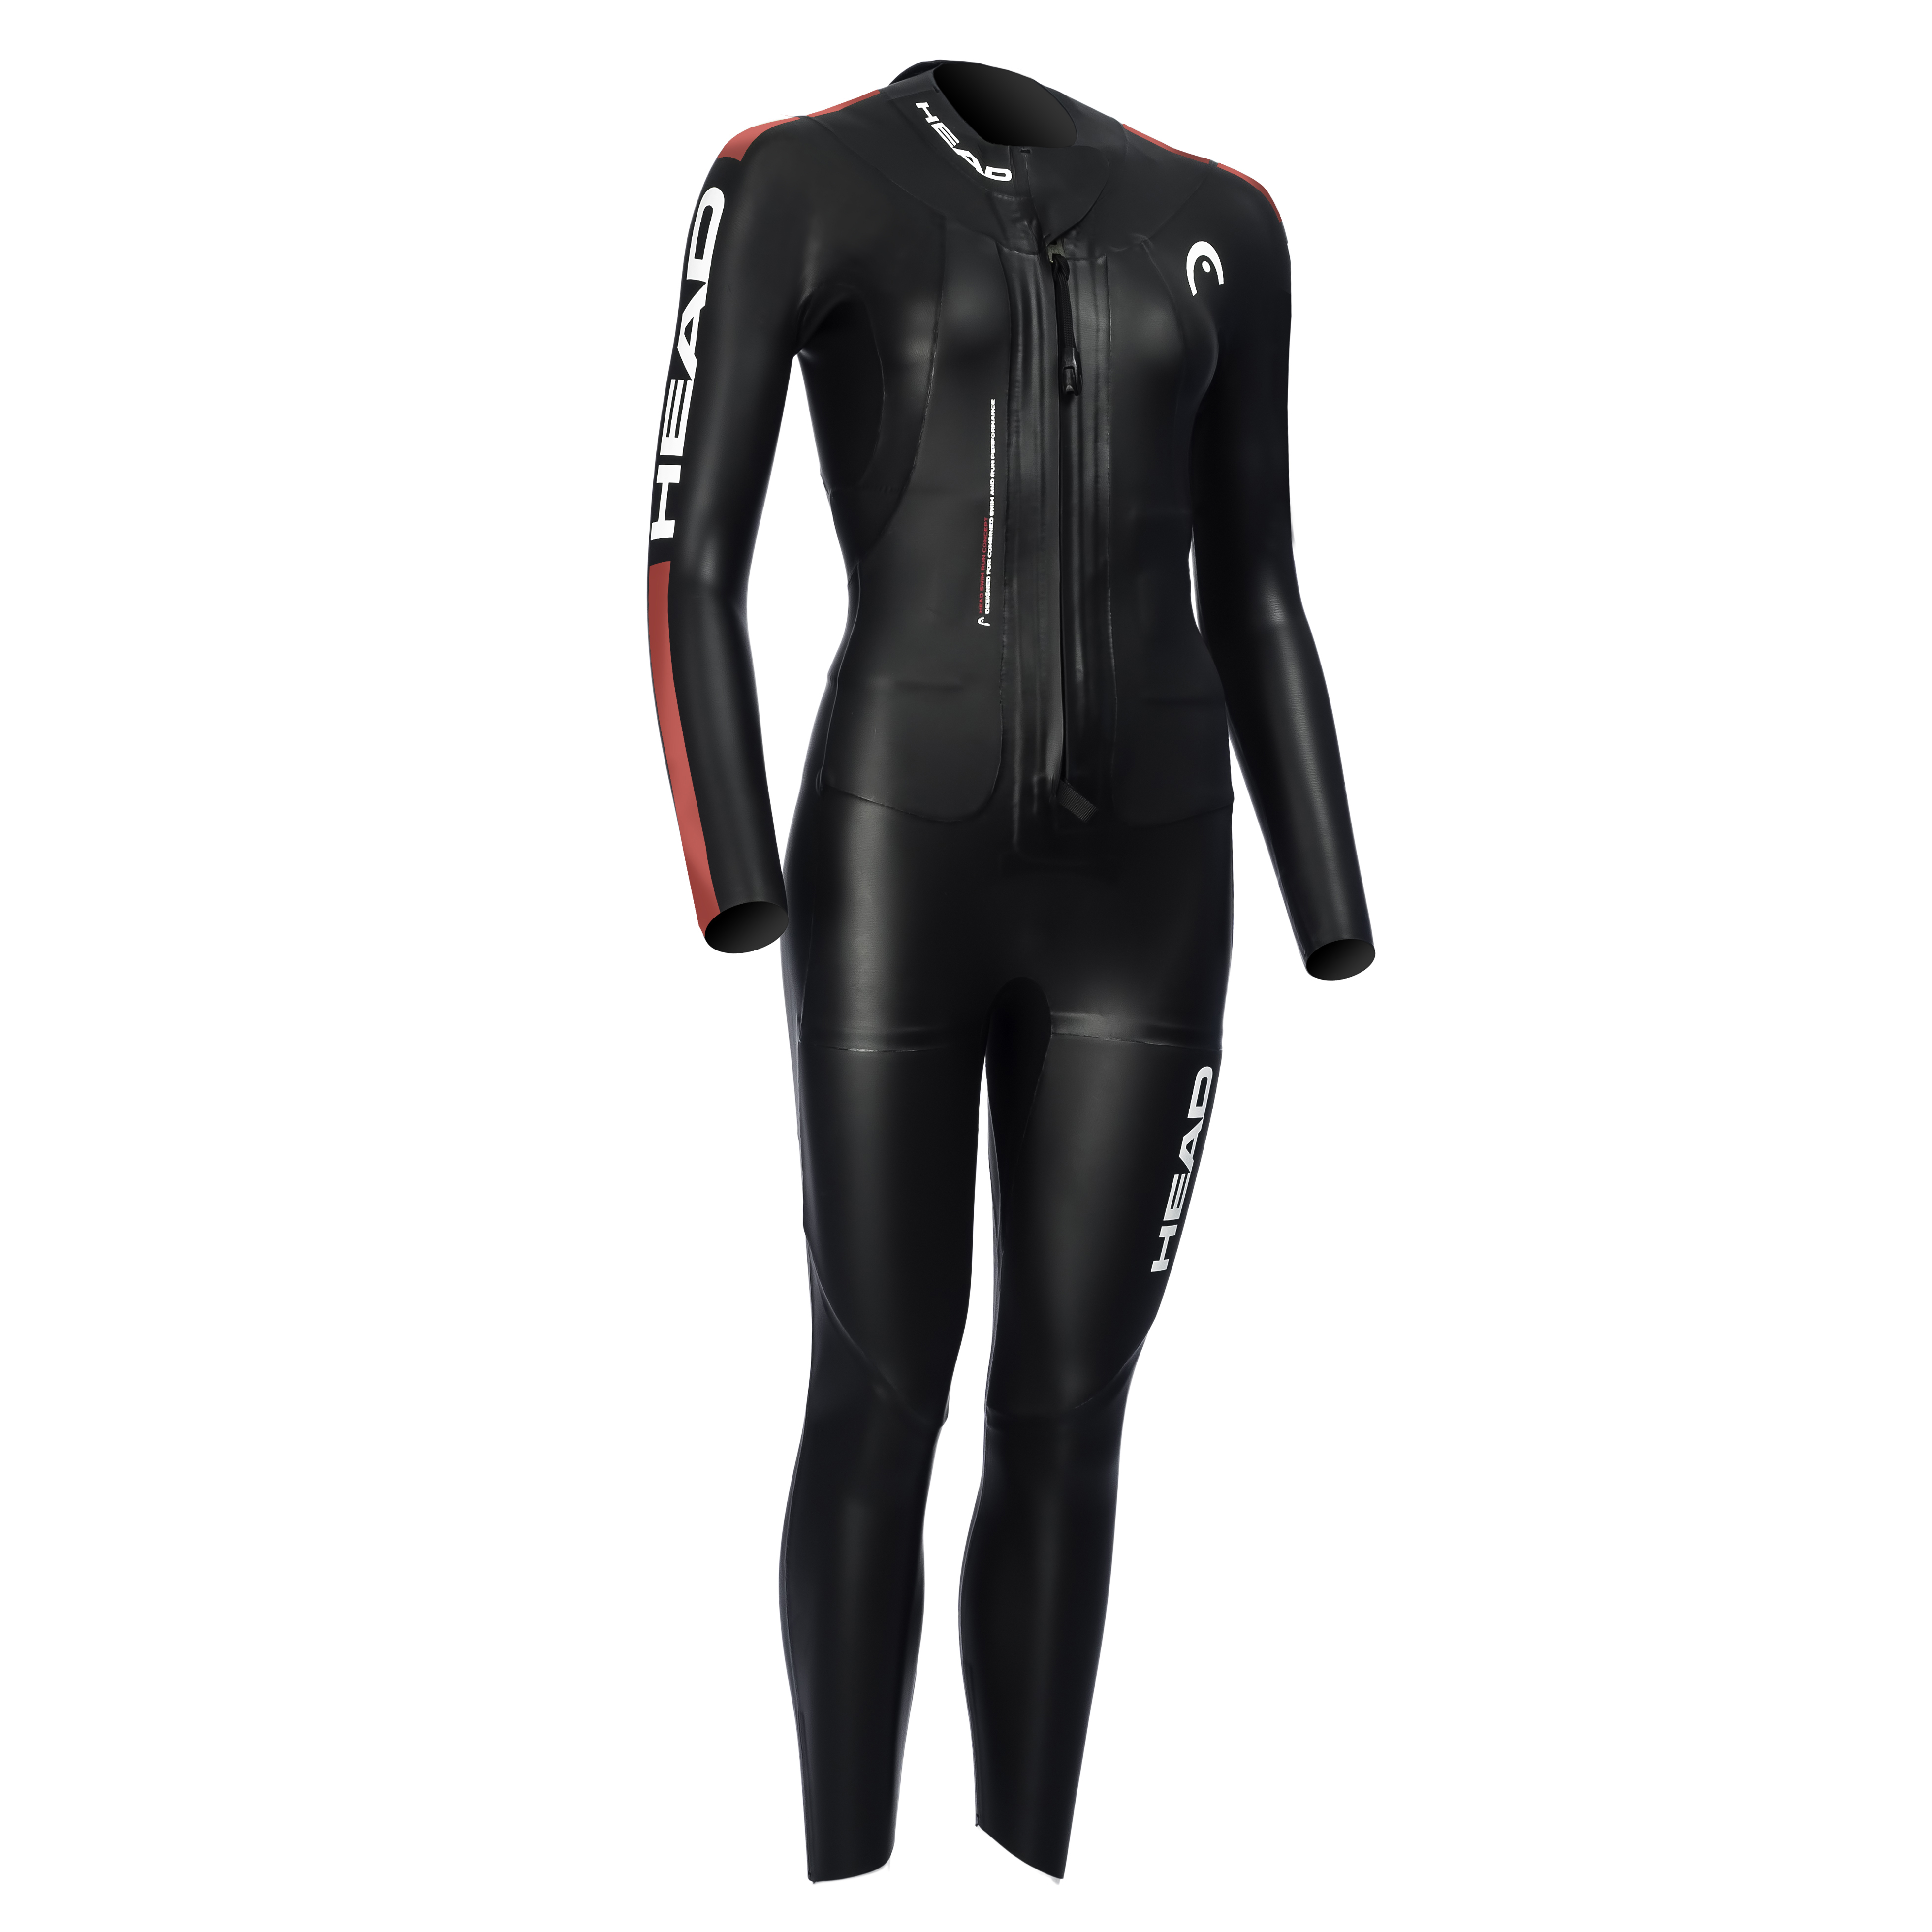 Wolff-Wear - Head Swim run suit Base Women da1ab0faa931